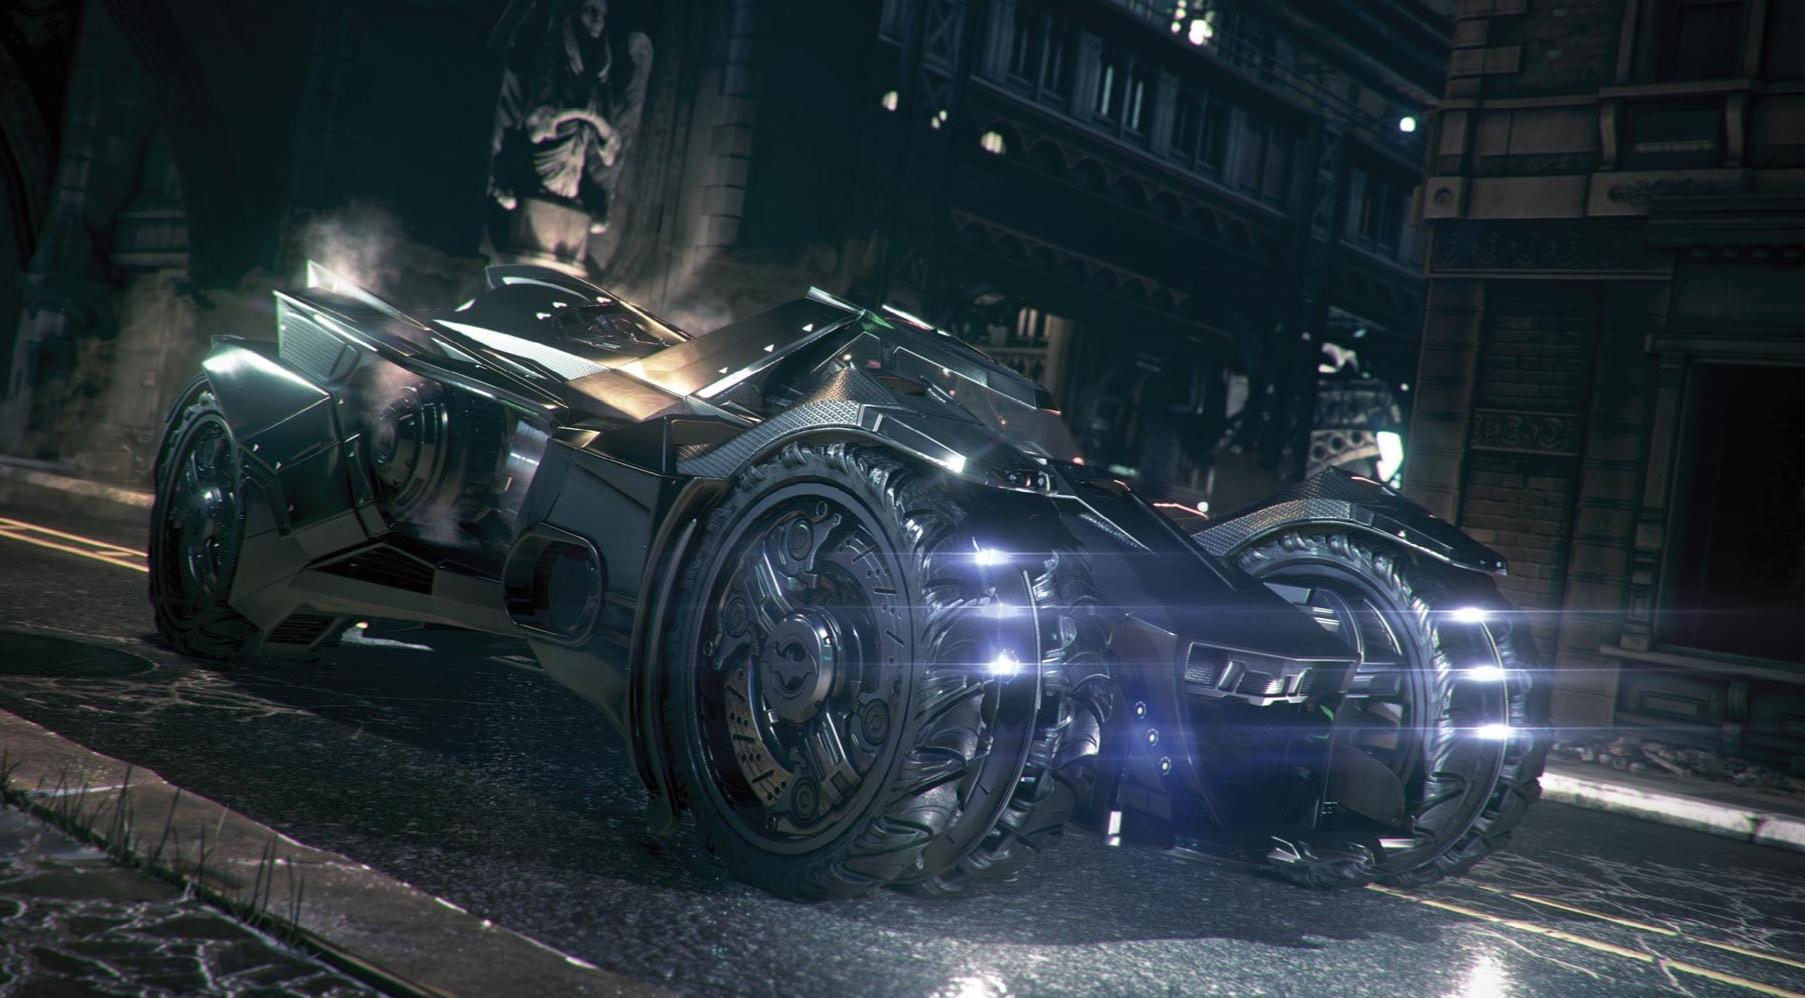 batman-arkham-knight-batmobile-battle-mode-trailer